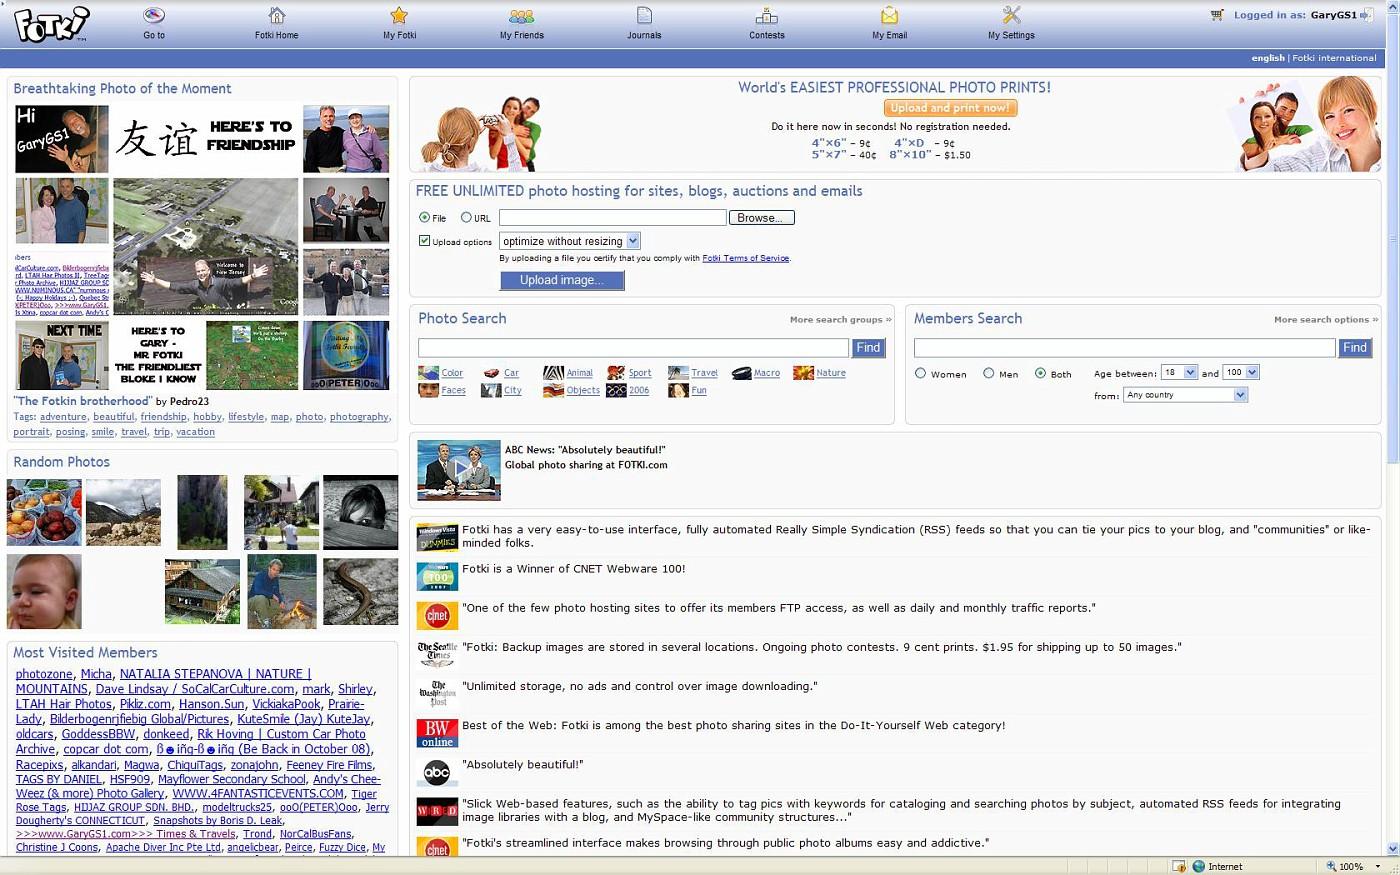 testPhotoTheFotkinBrotherhood_-vi.jpg